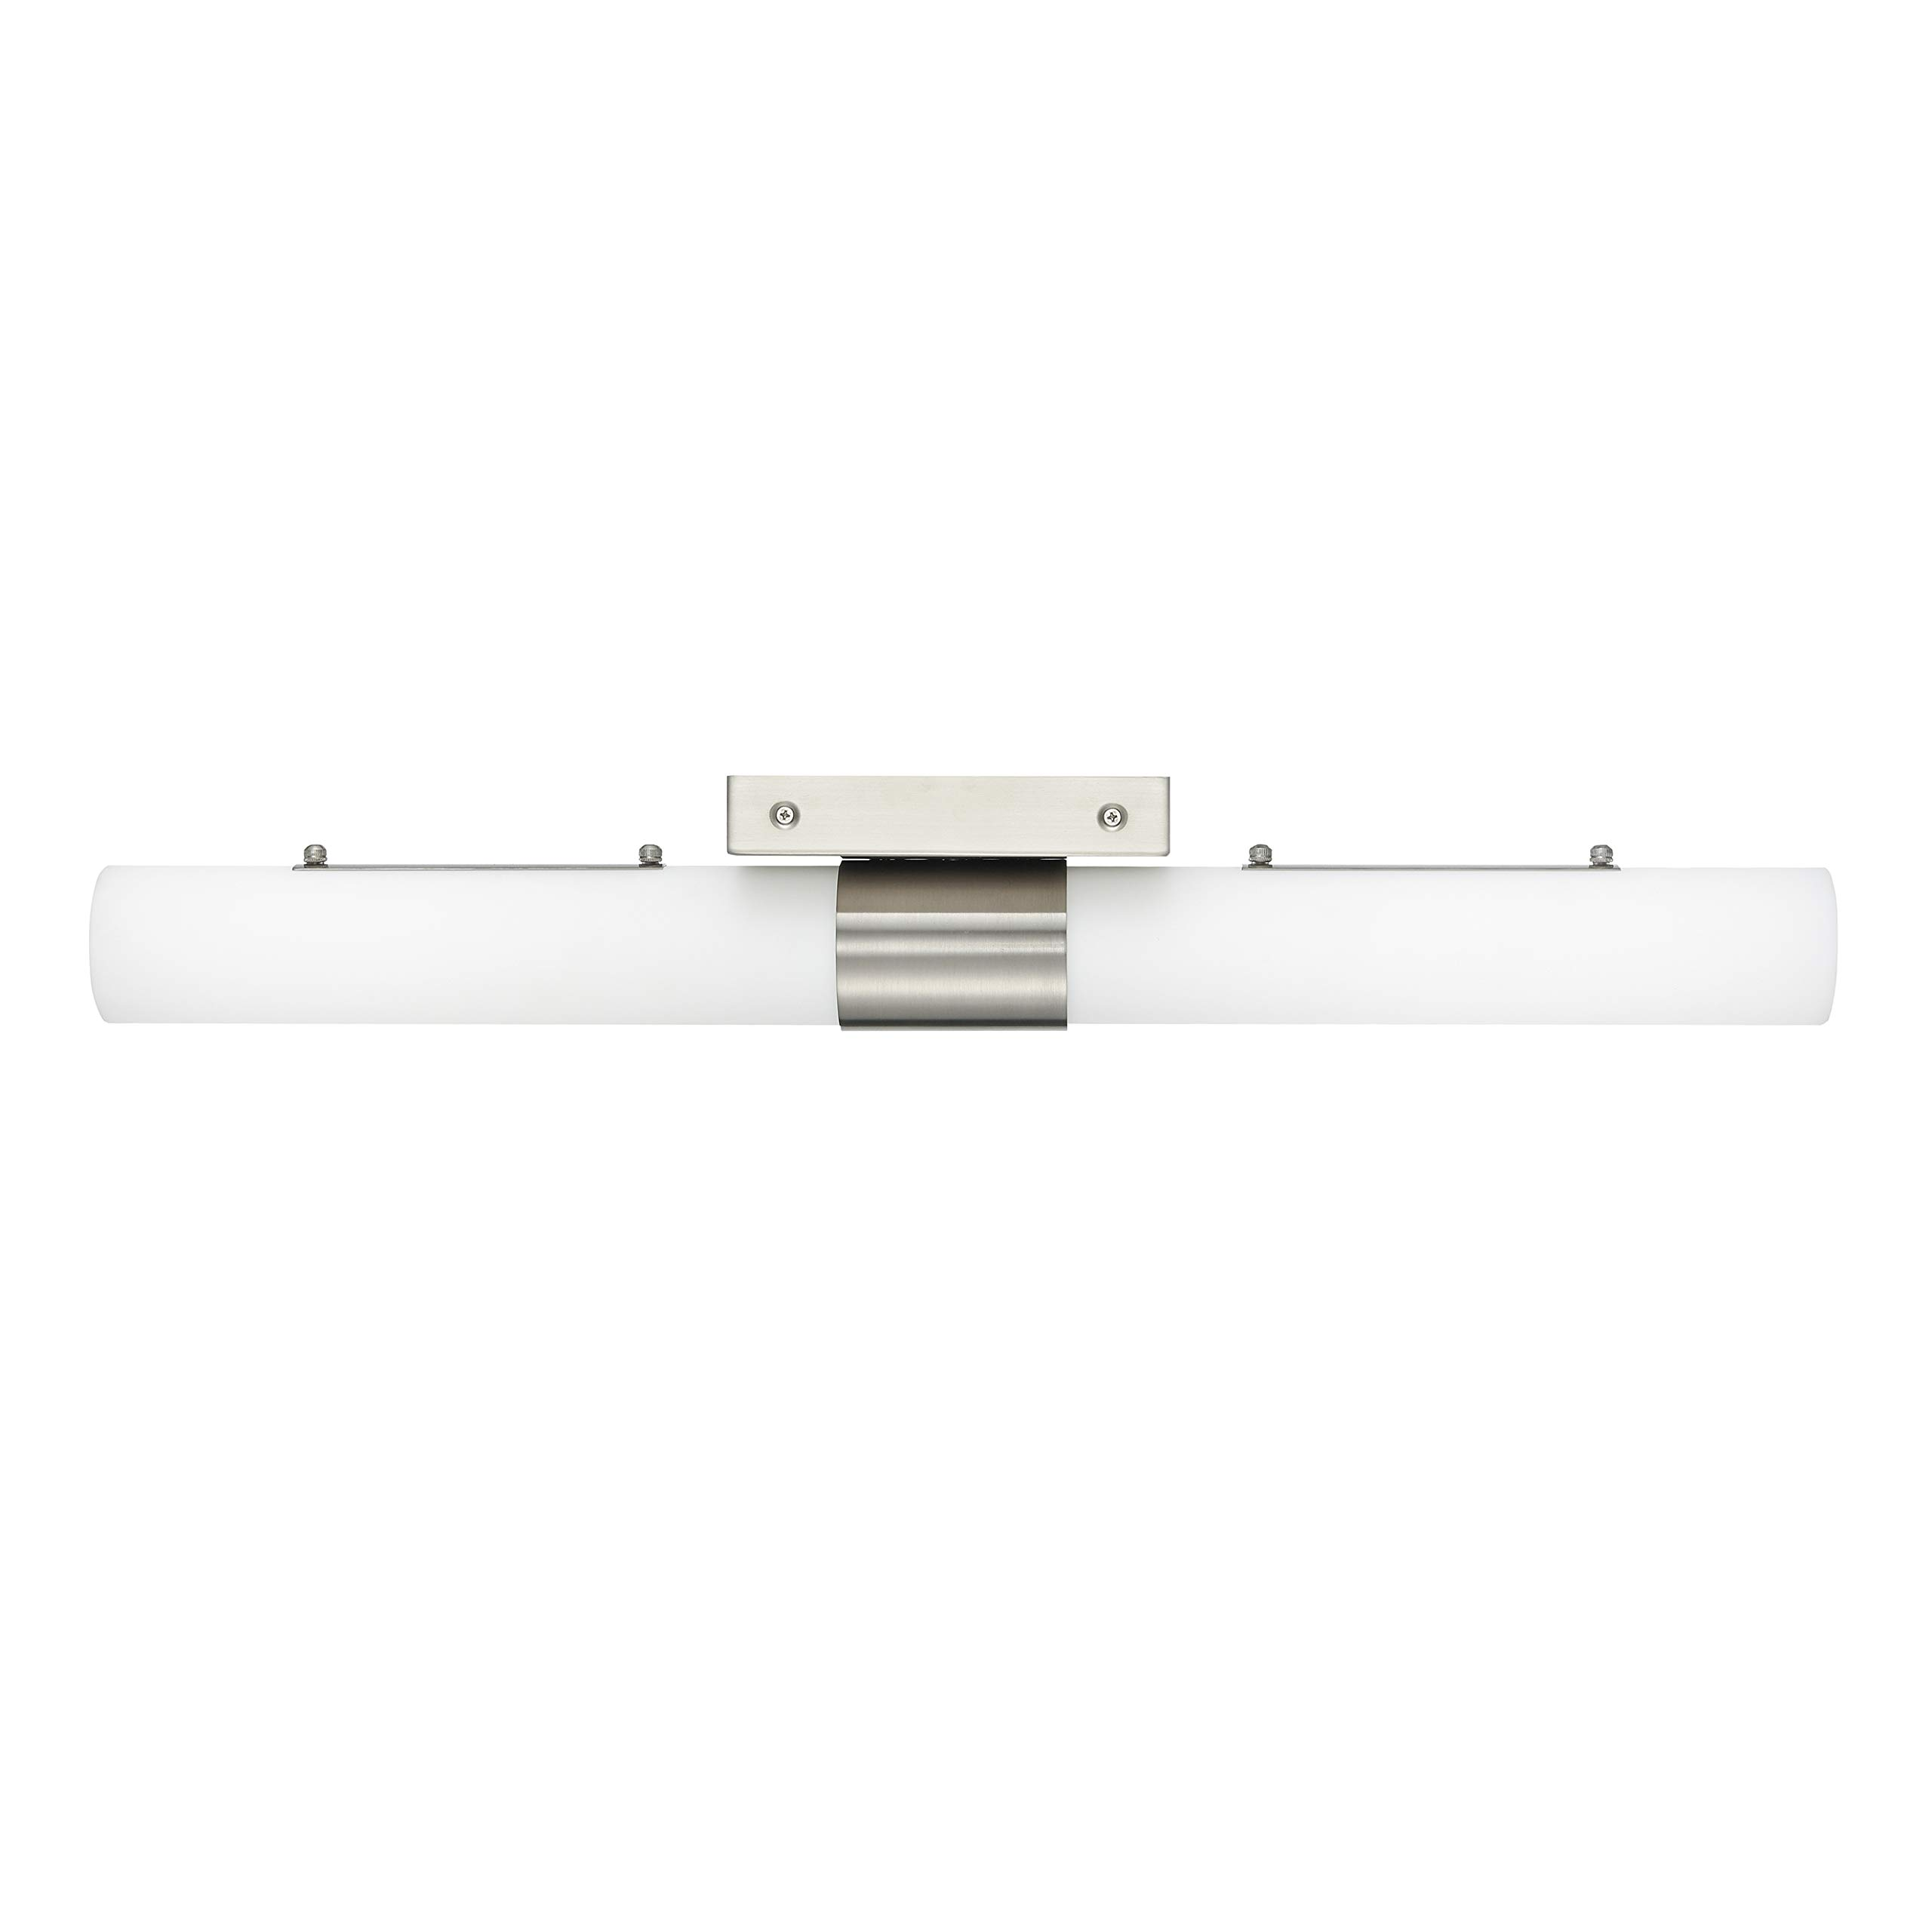 Perpetua 30 inch Integrated LED Bathroom Vanity Lights | Brushed Nickel Bathroom Light LL-SC1043-BN by Linea di Liara (Image #6)